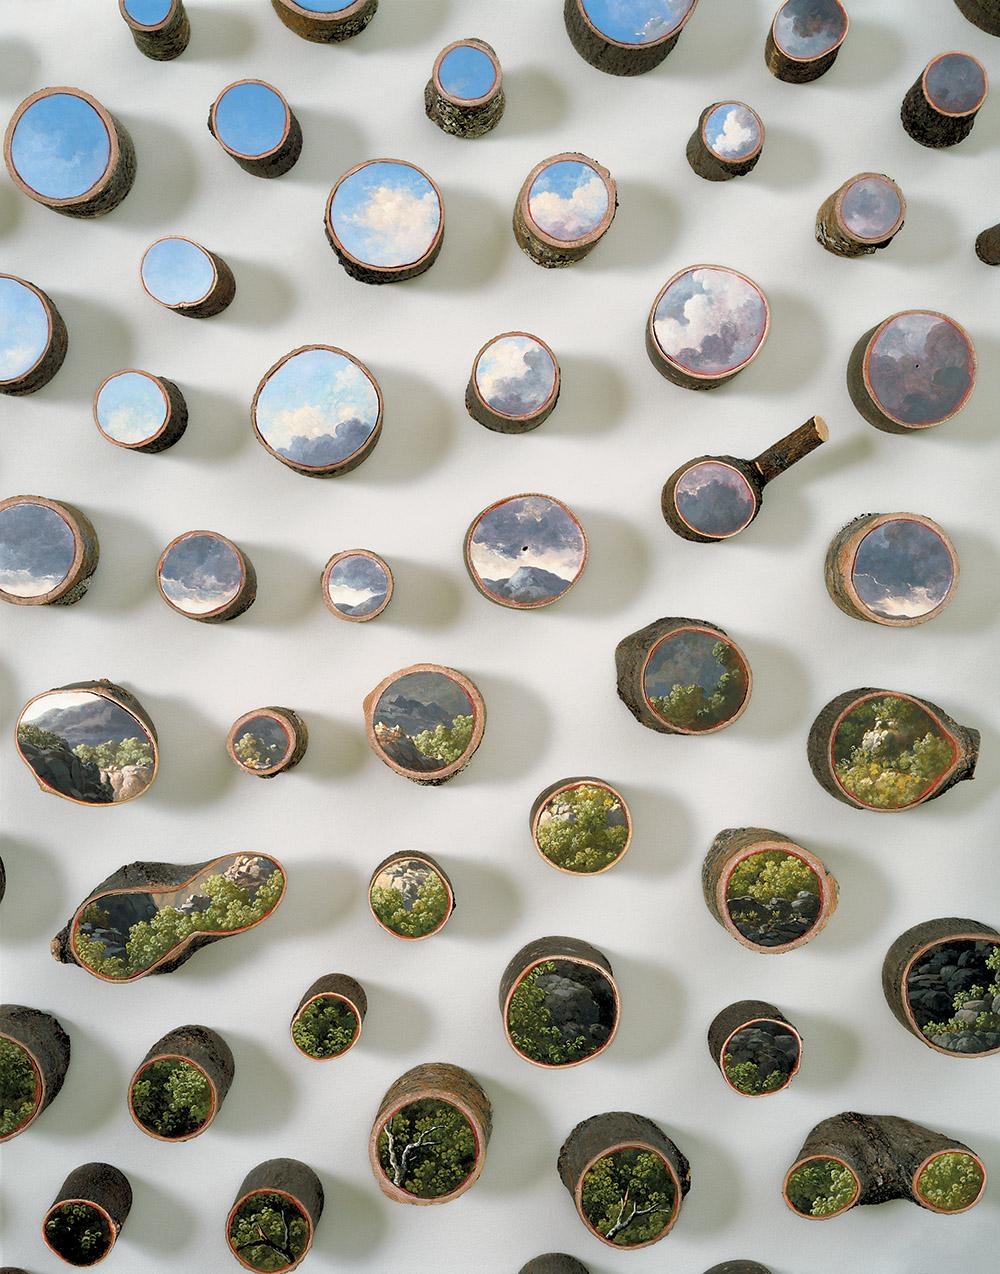 Moritsugu_Wildernes_detail_1998.jpg